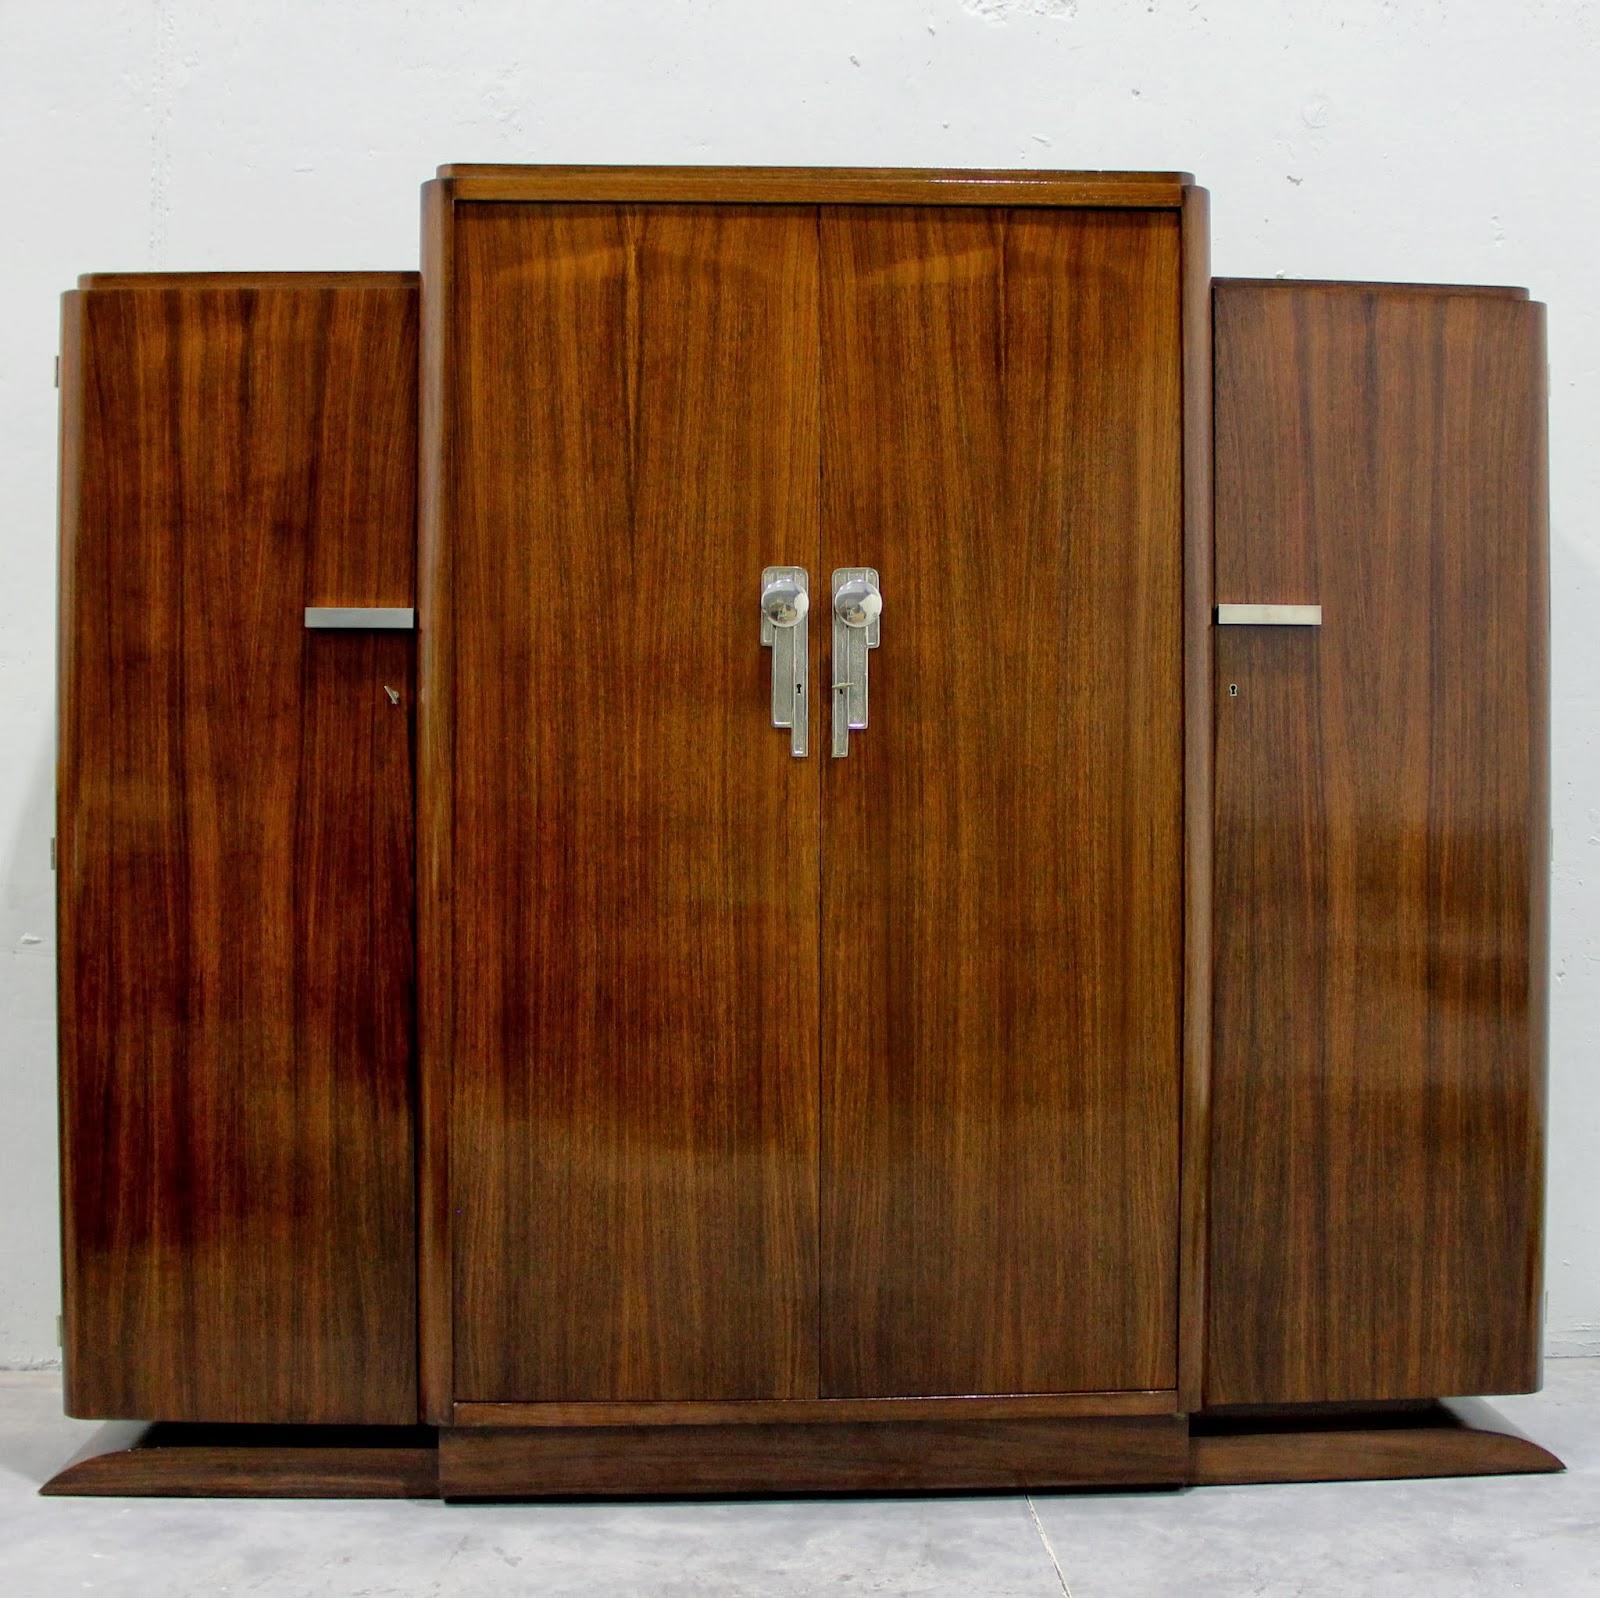 Odalisca madrid art nouveau art deco dise o del siglo for Muebles sabino